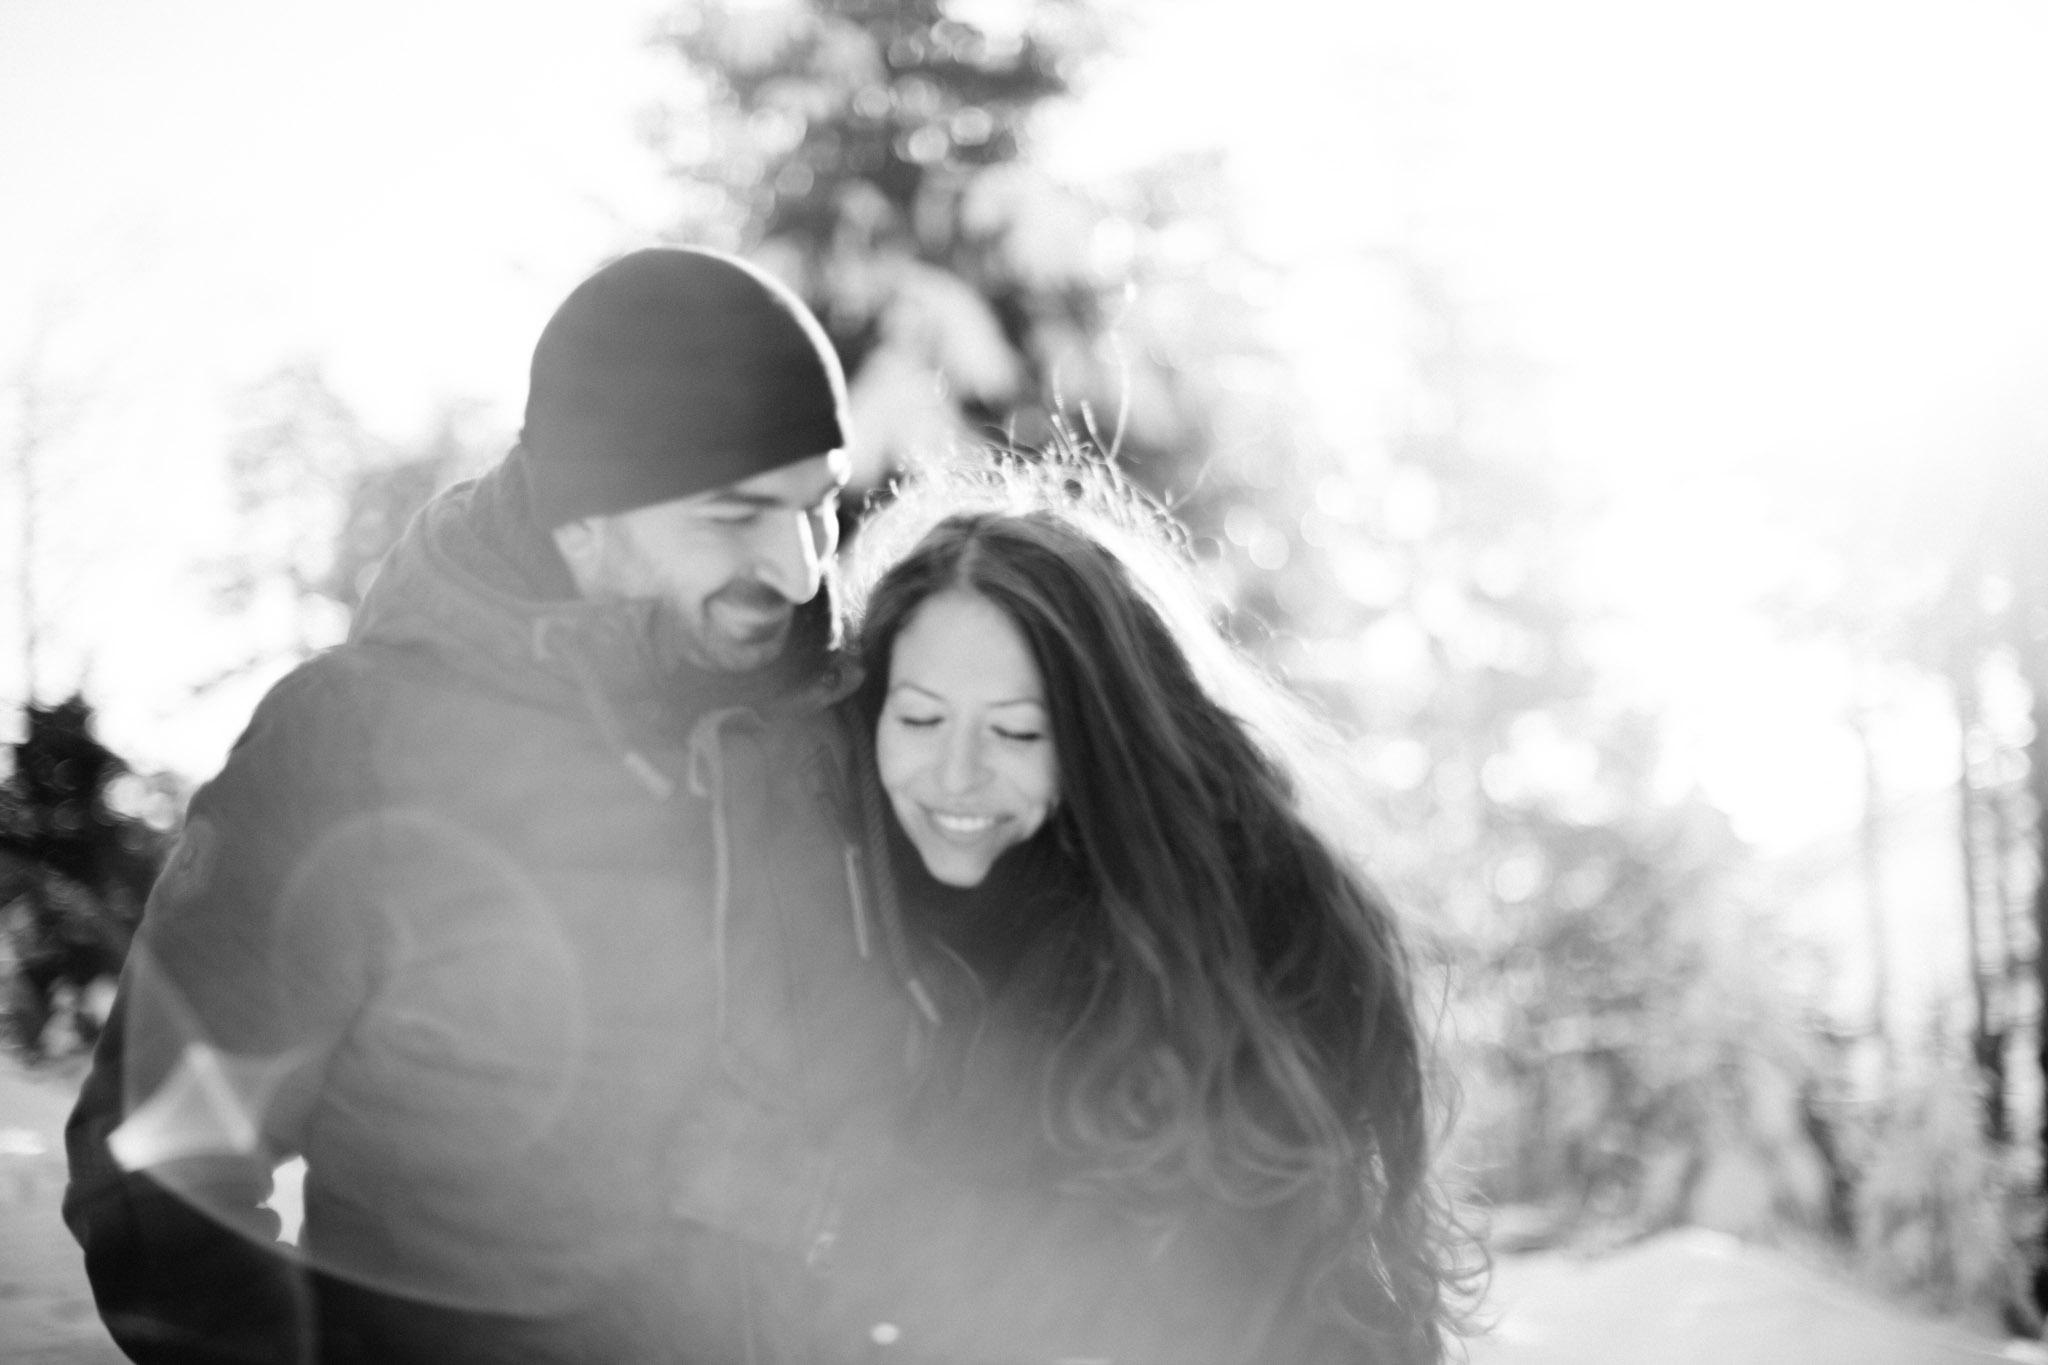 Grosser-Feldberg-Frankfurt-Engagement-Pia-Anna-Christian-Wedding-Photography-SE-58.jpg